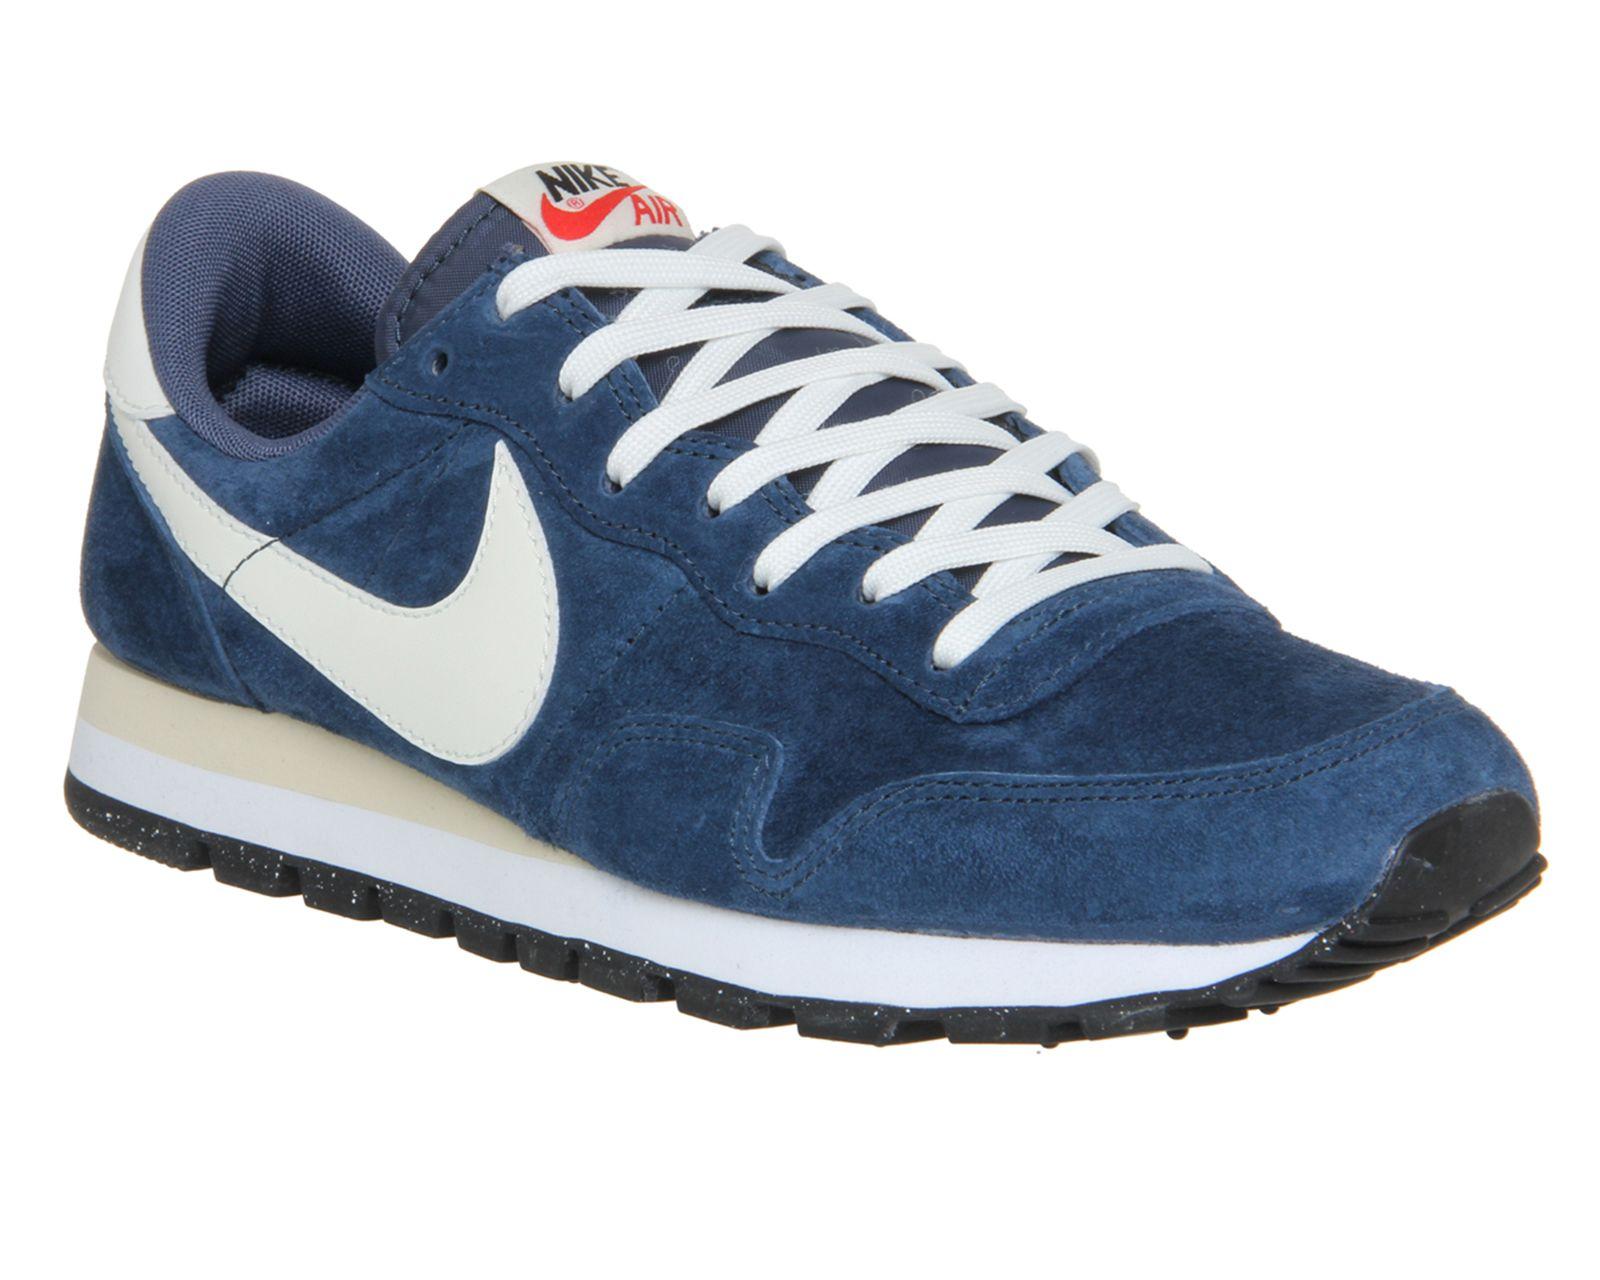 Nike Nike Air Pegasus 83 Squadron Blue Sail Leather - His trainers